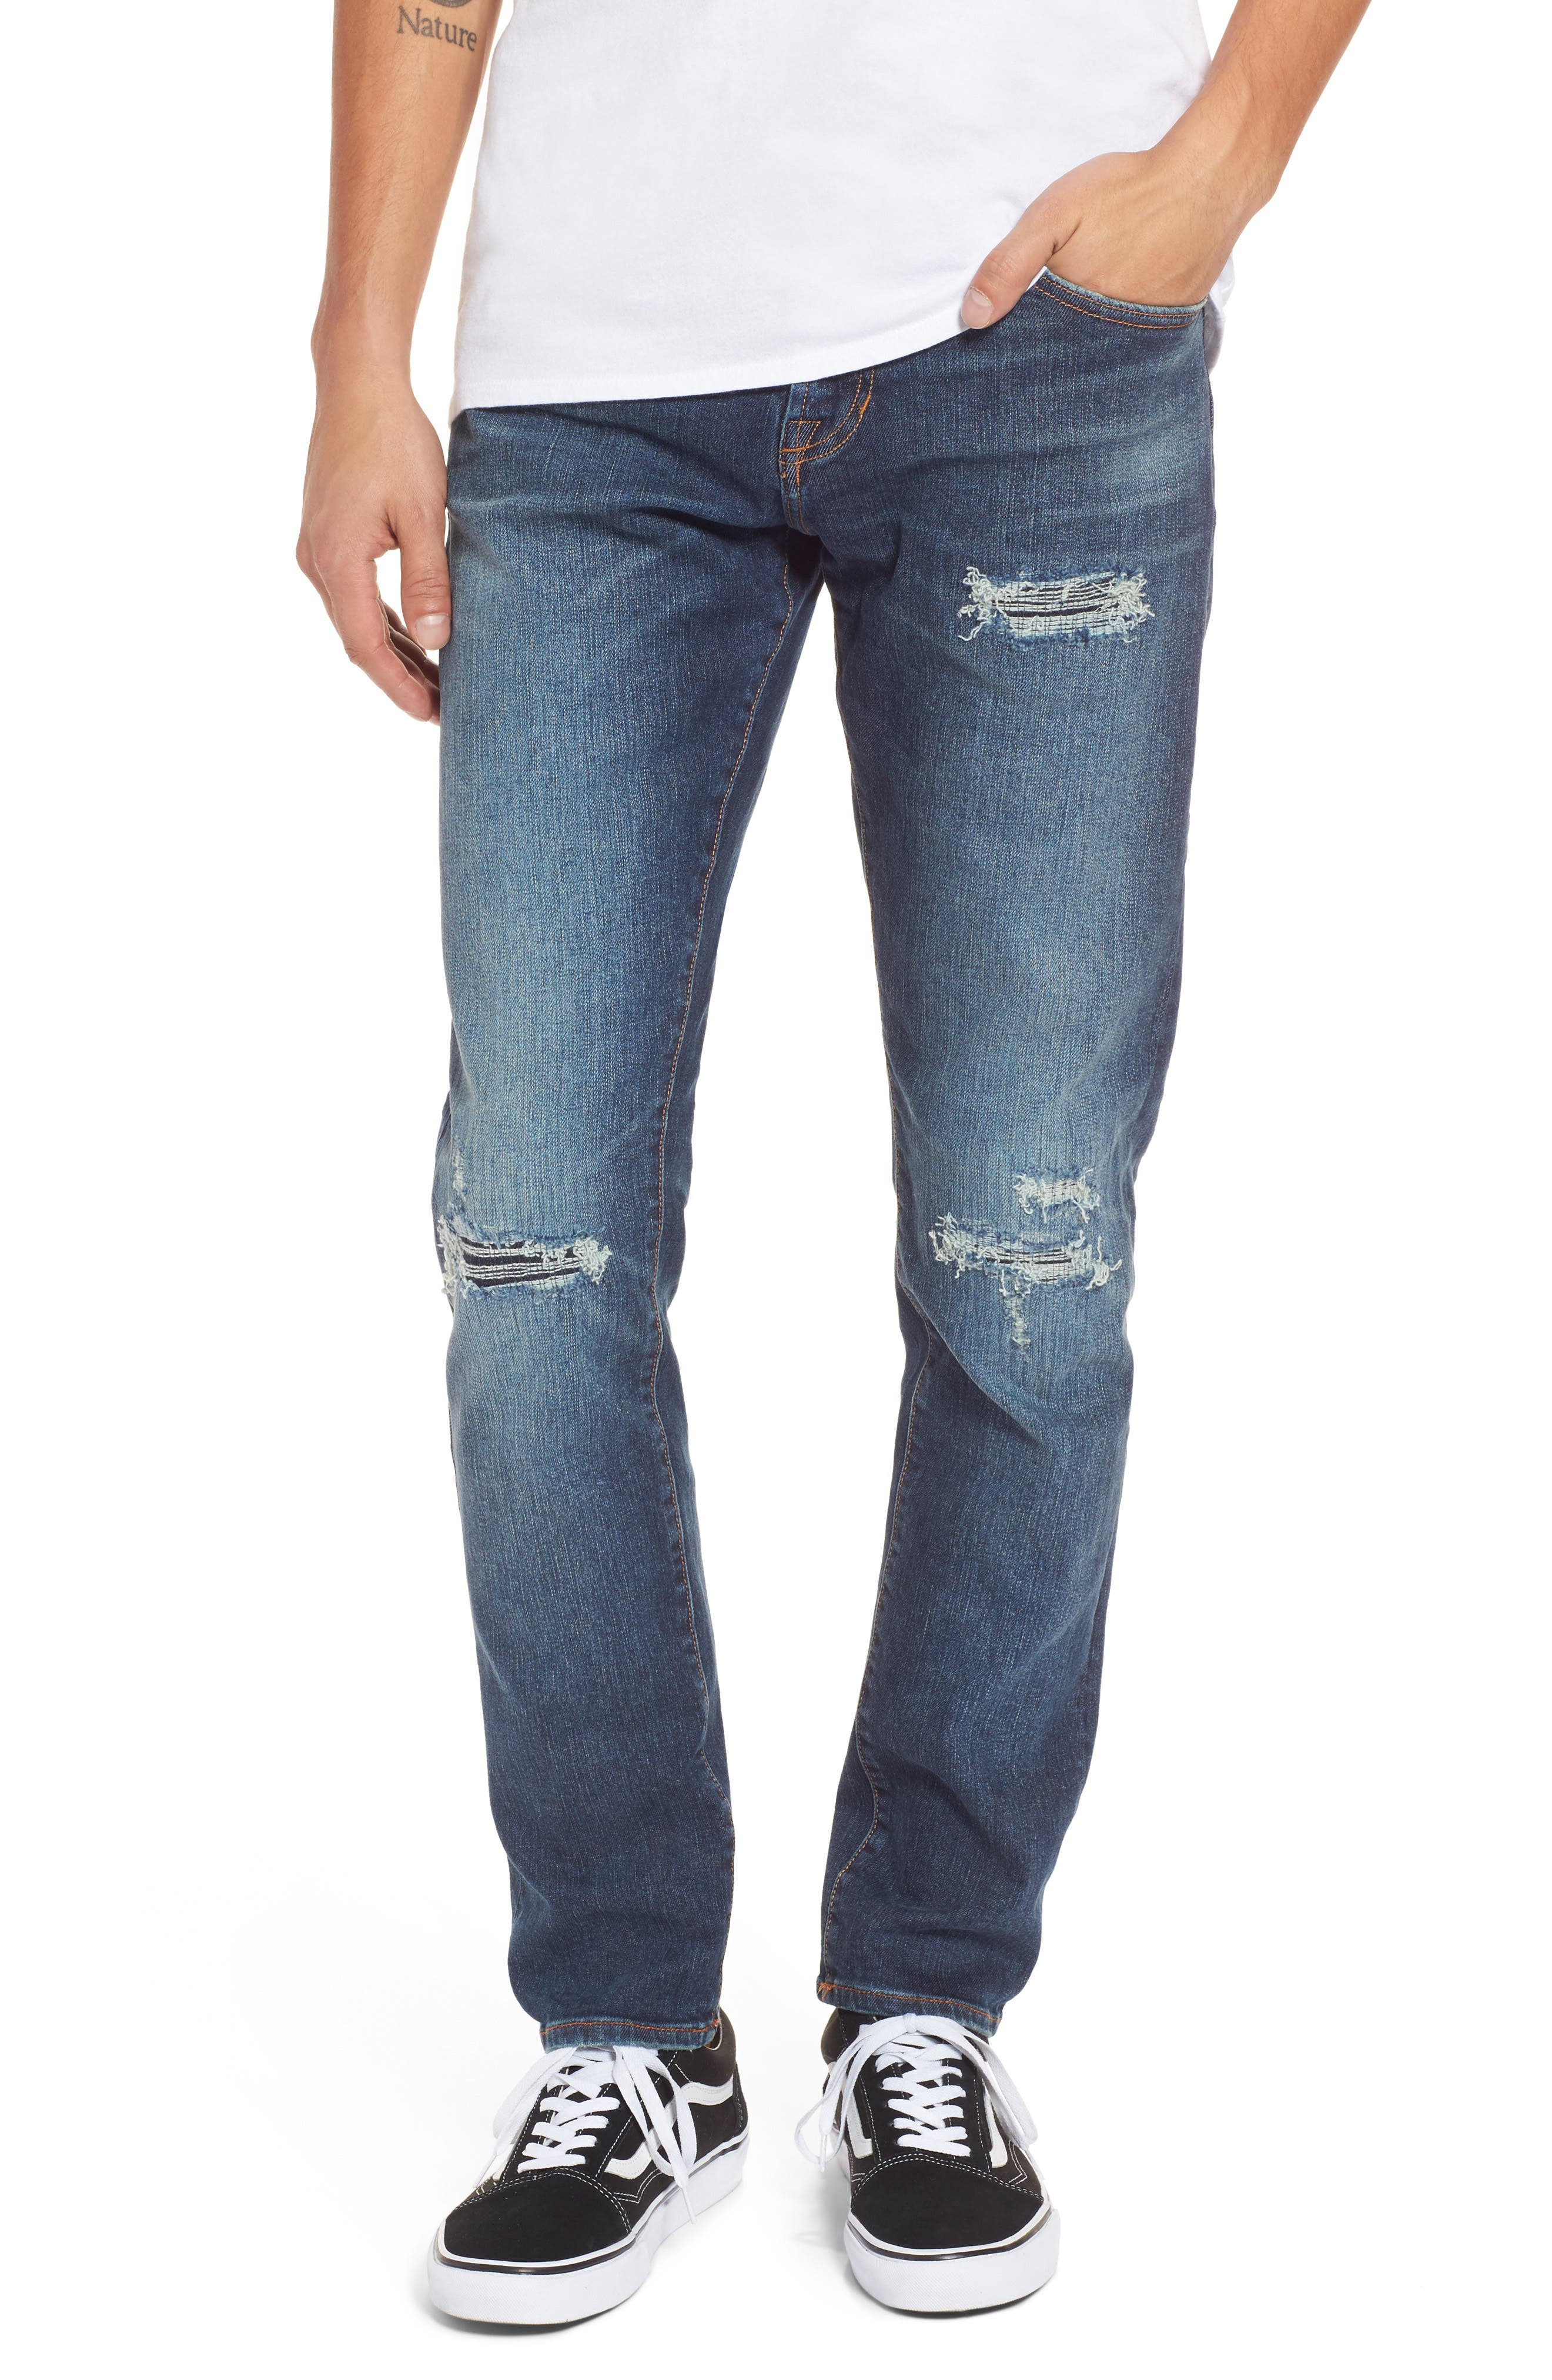 Jean Shop Kip Skinny Fit Jeans (Stretch Brewster)